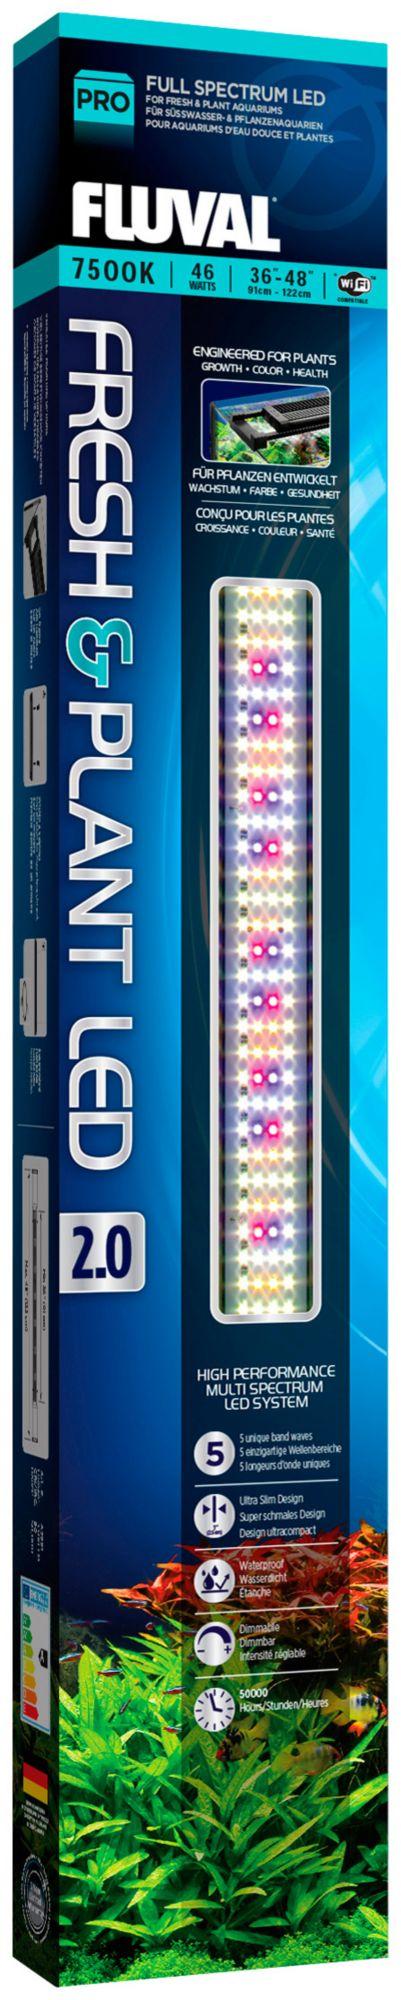 FLUVAL LED-Aquarien-Beleuchtung »Fresh & Plant 2.0 LED«